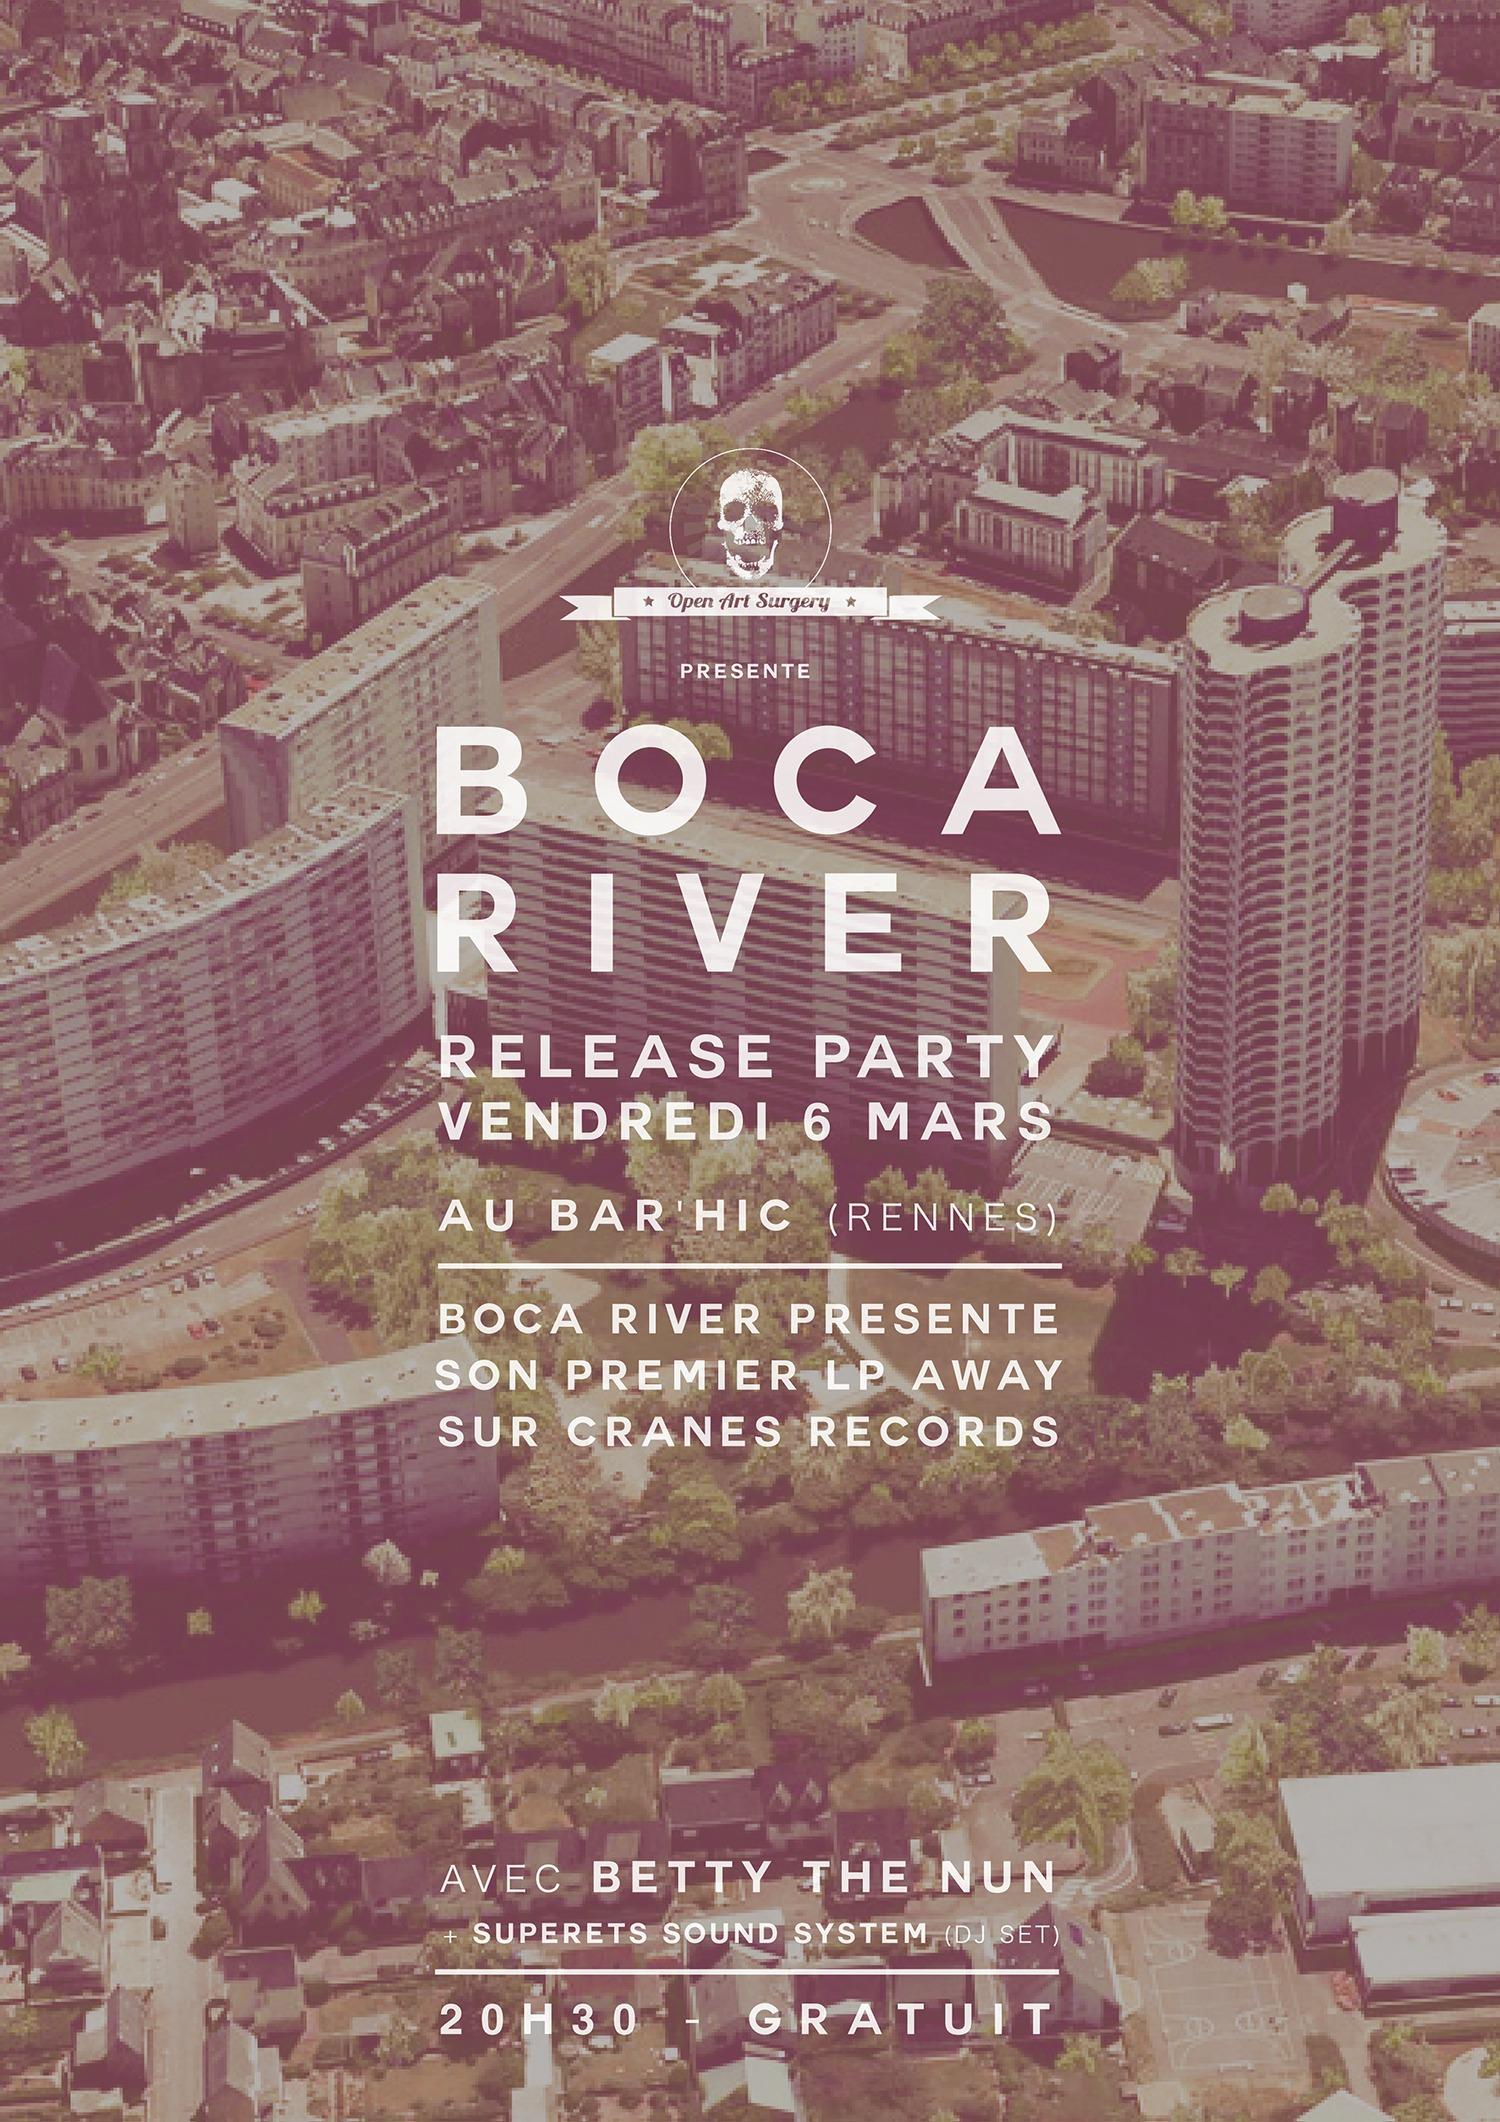 Boca-River-affiche-release-064-web